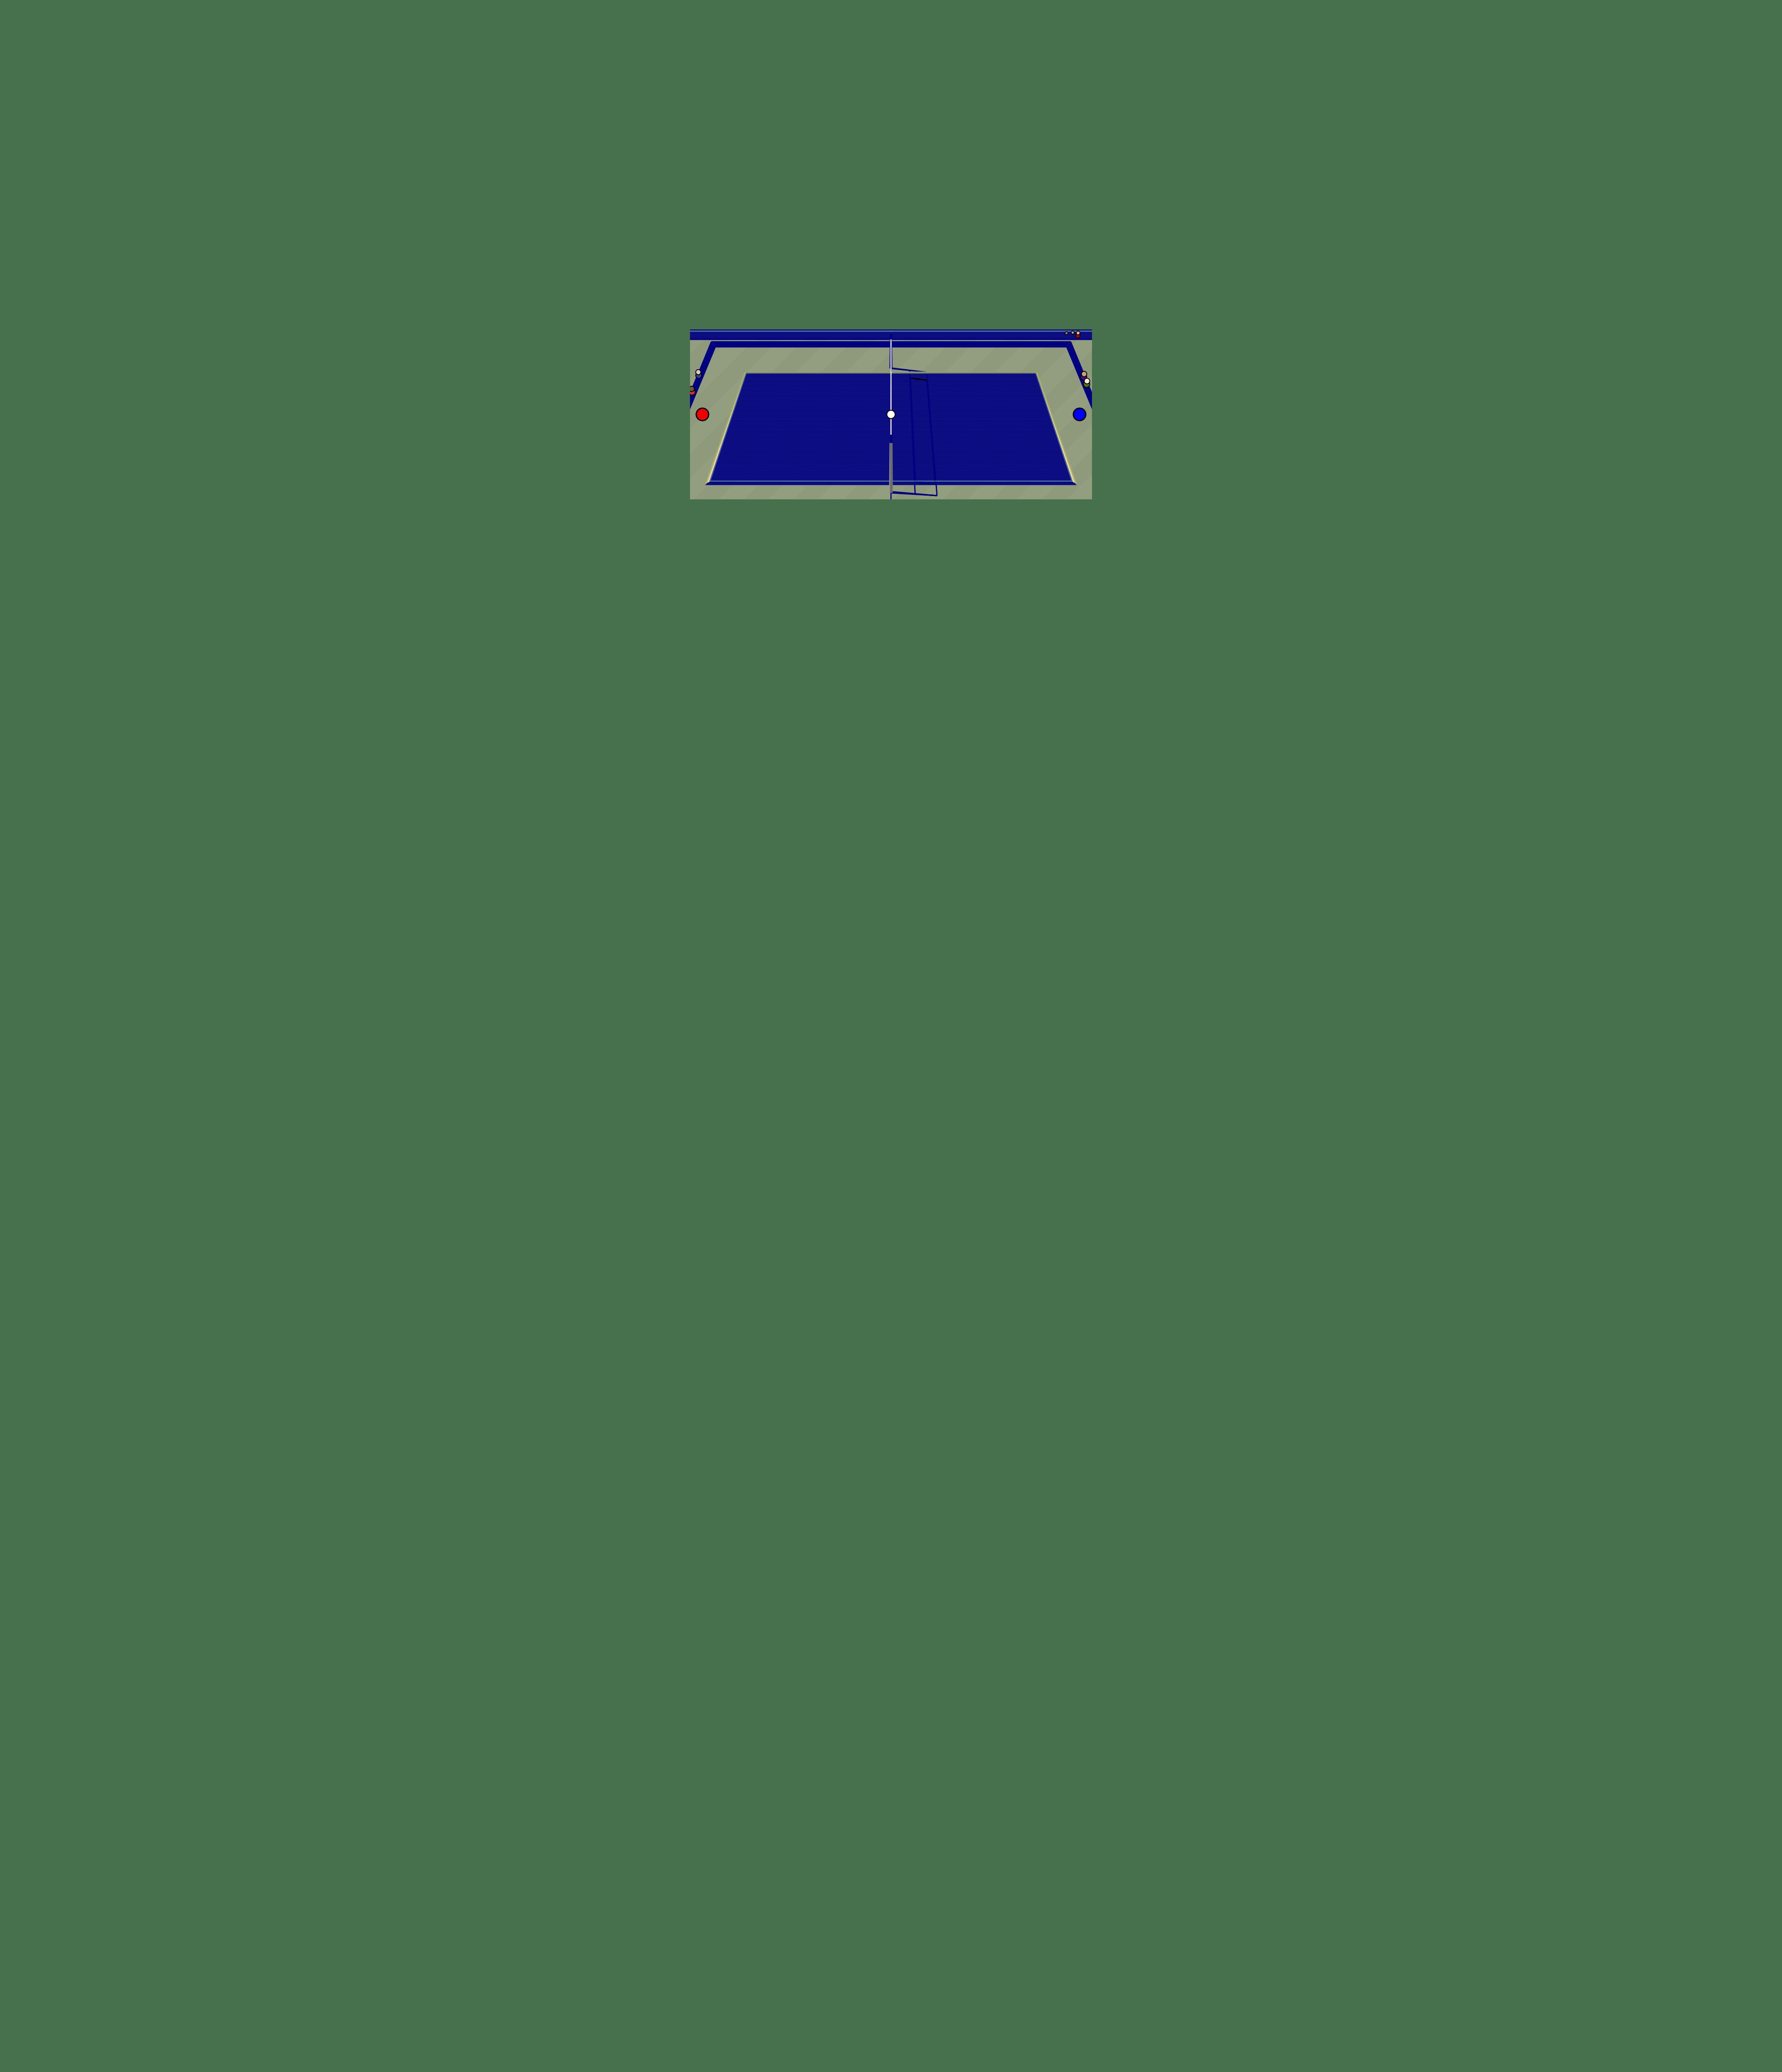 hax ball maps   Voleybol3d Dark Mode